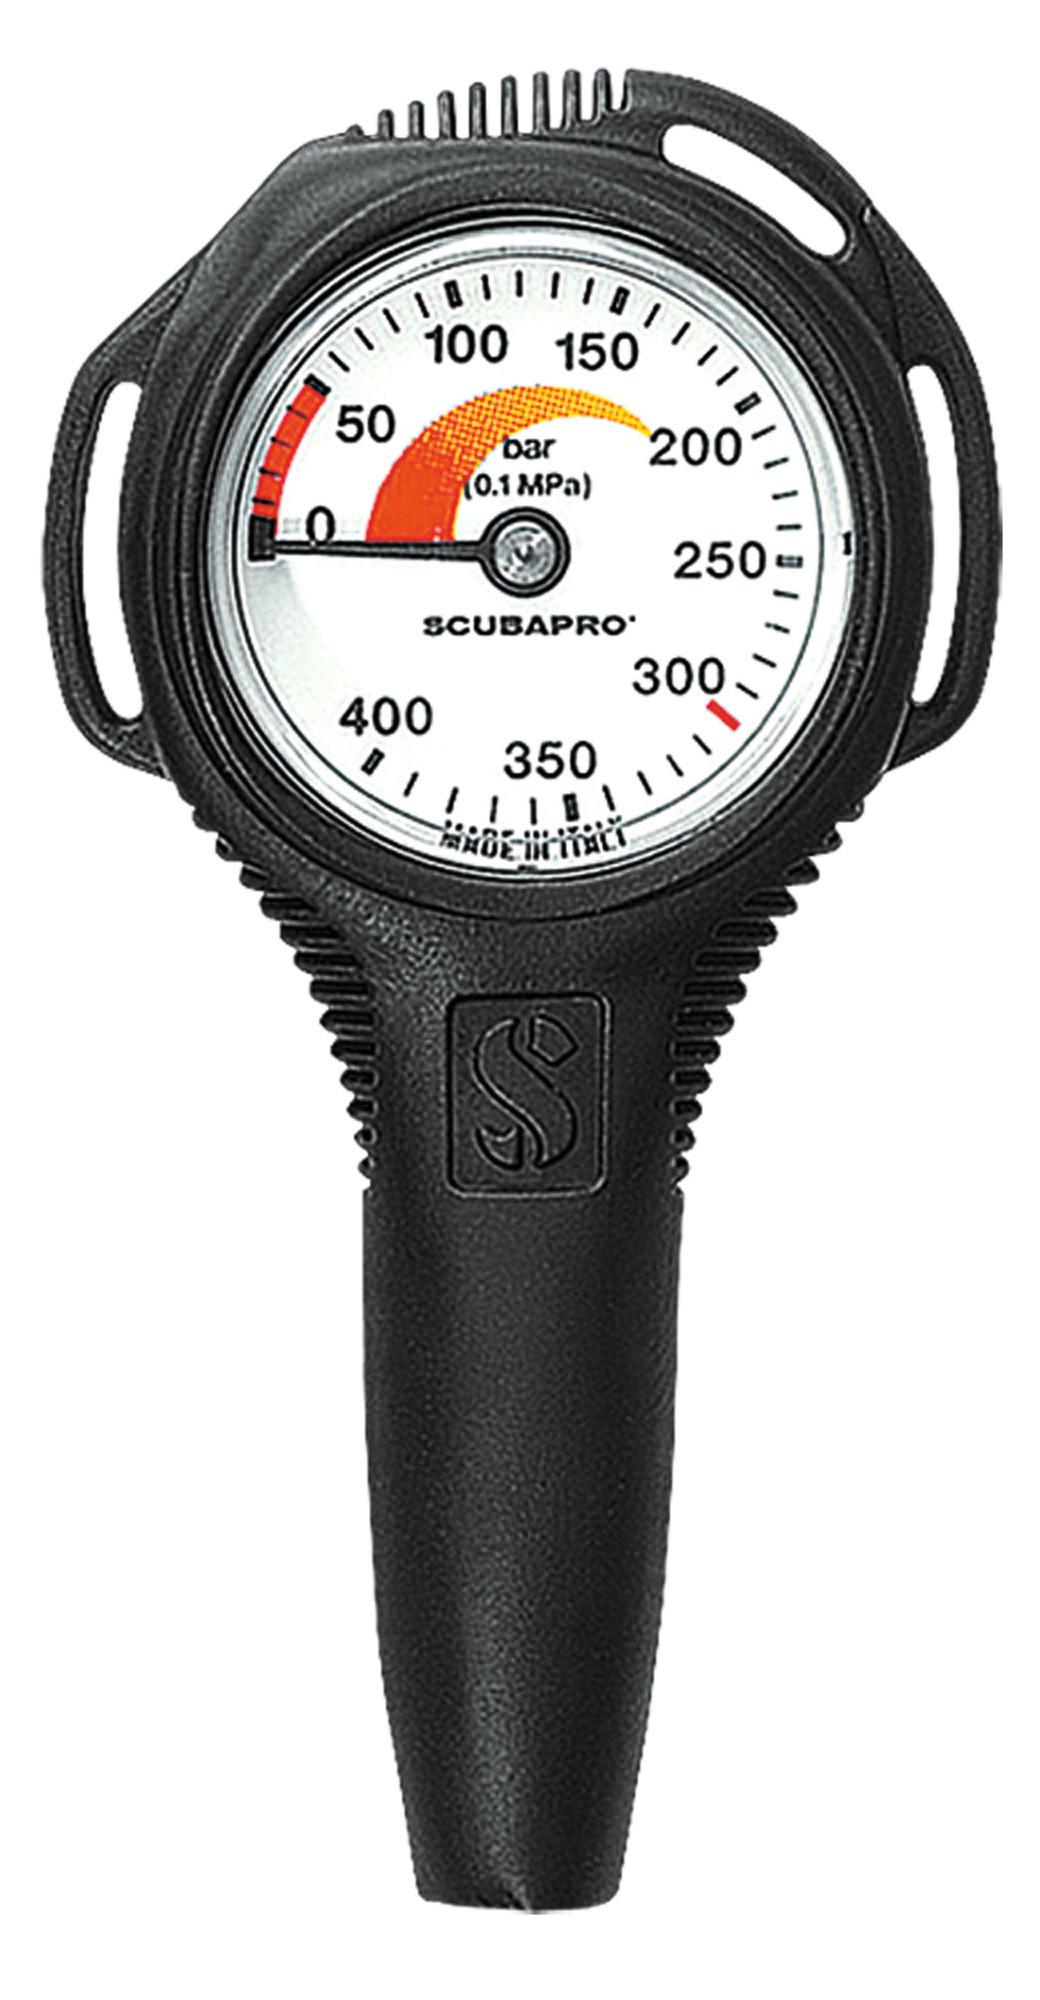 COMPACT manometer 400 bar-1